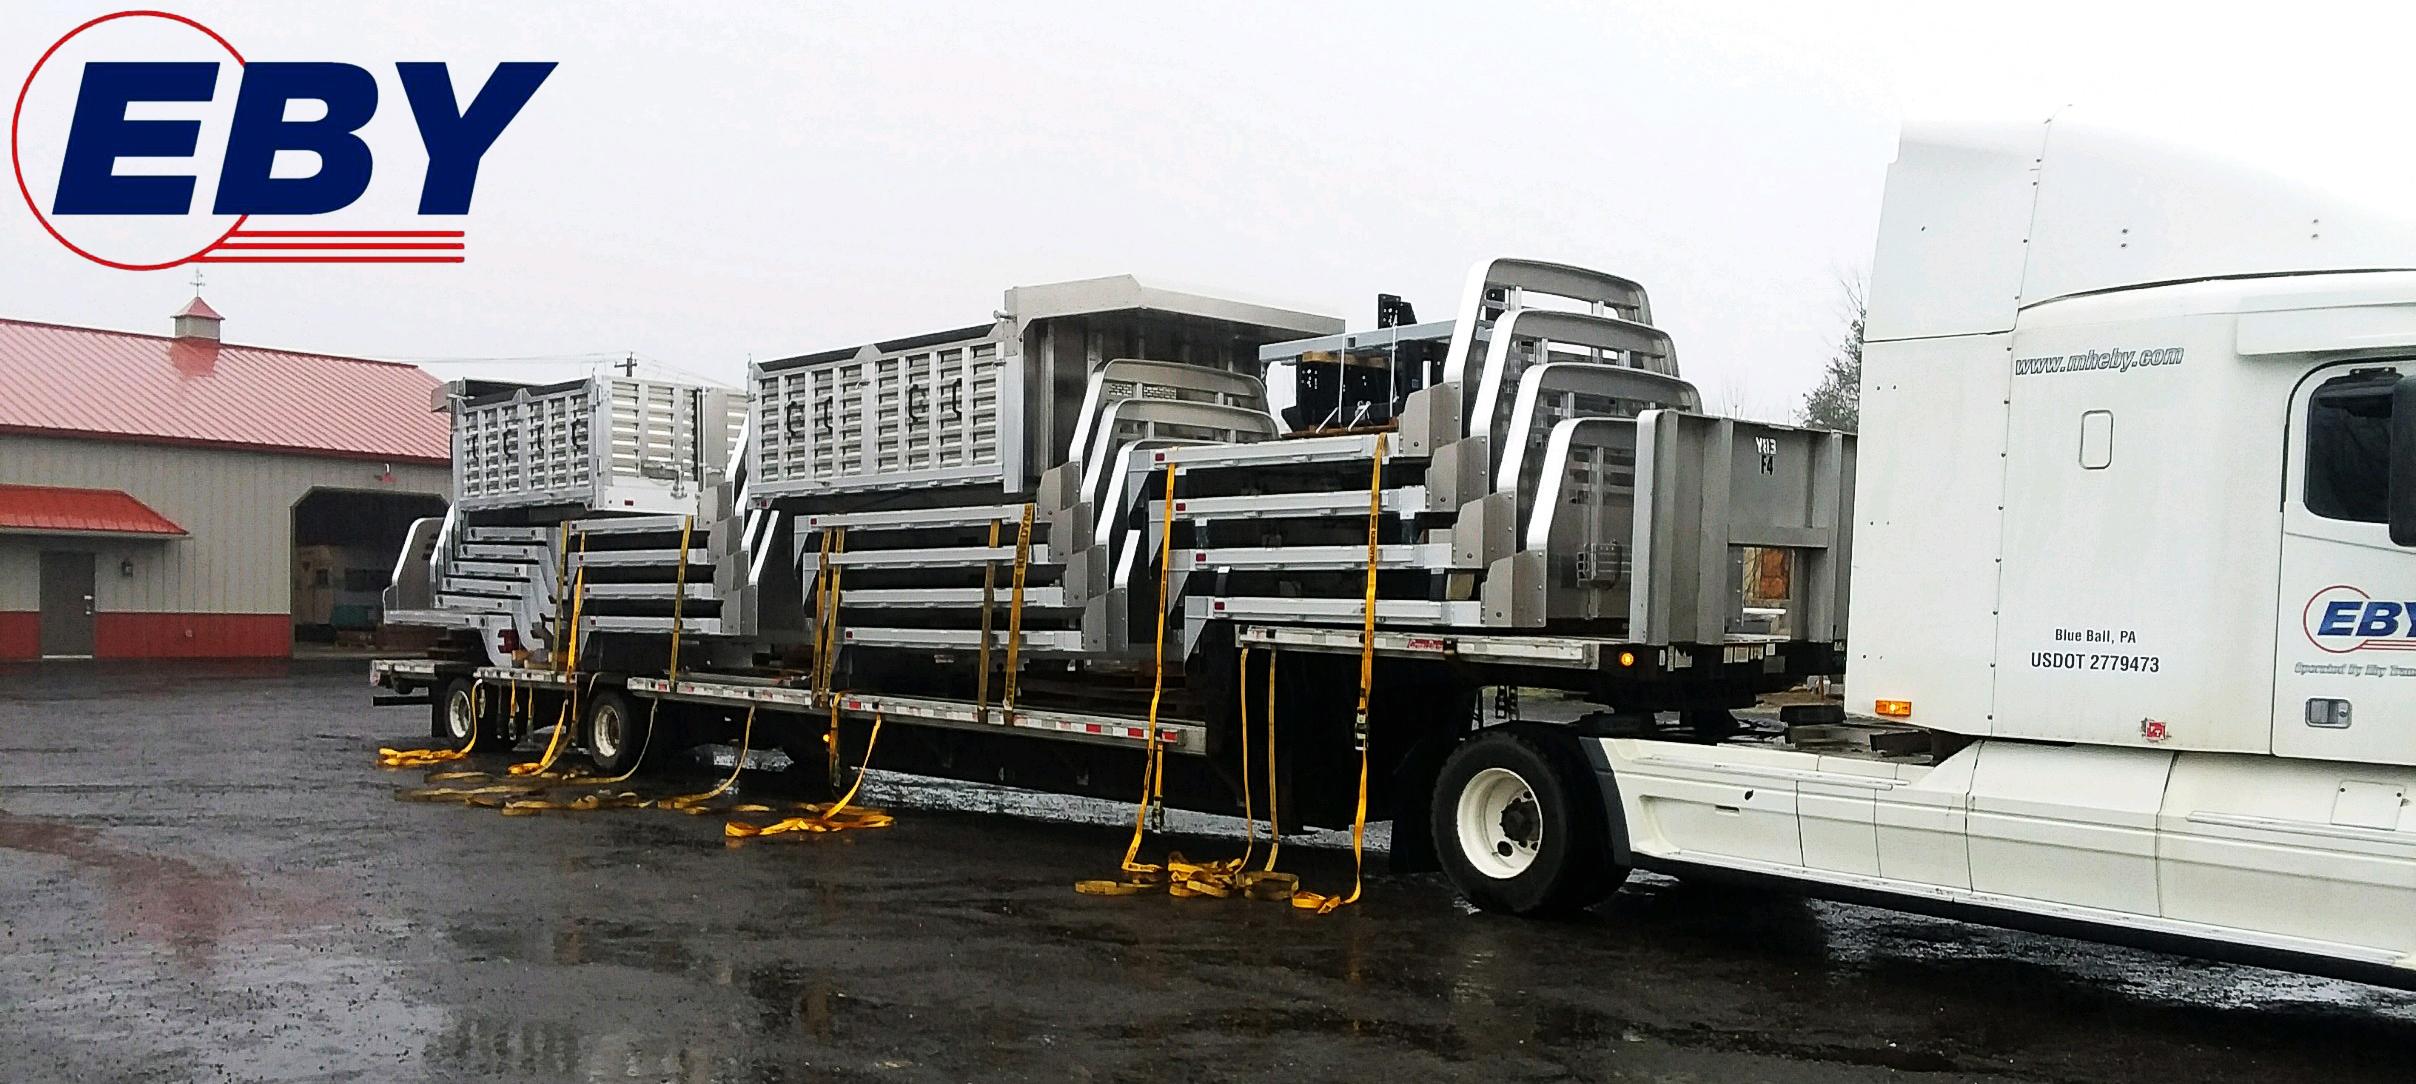 Picture of: Netd Custom Aluminum Fabrication Custom Truck Bodies Dump Bodies Fenders Toolboxes Boss Snowplows Lighting And More